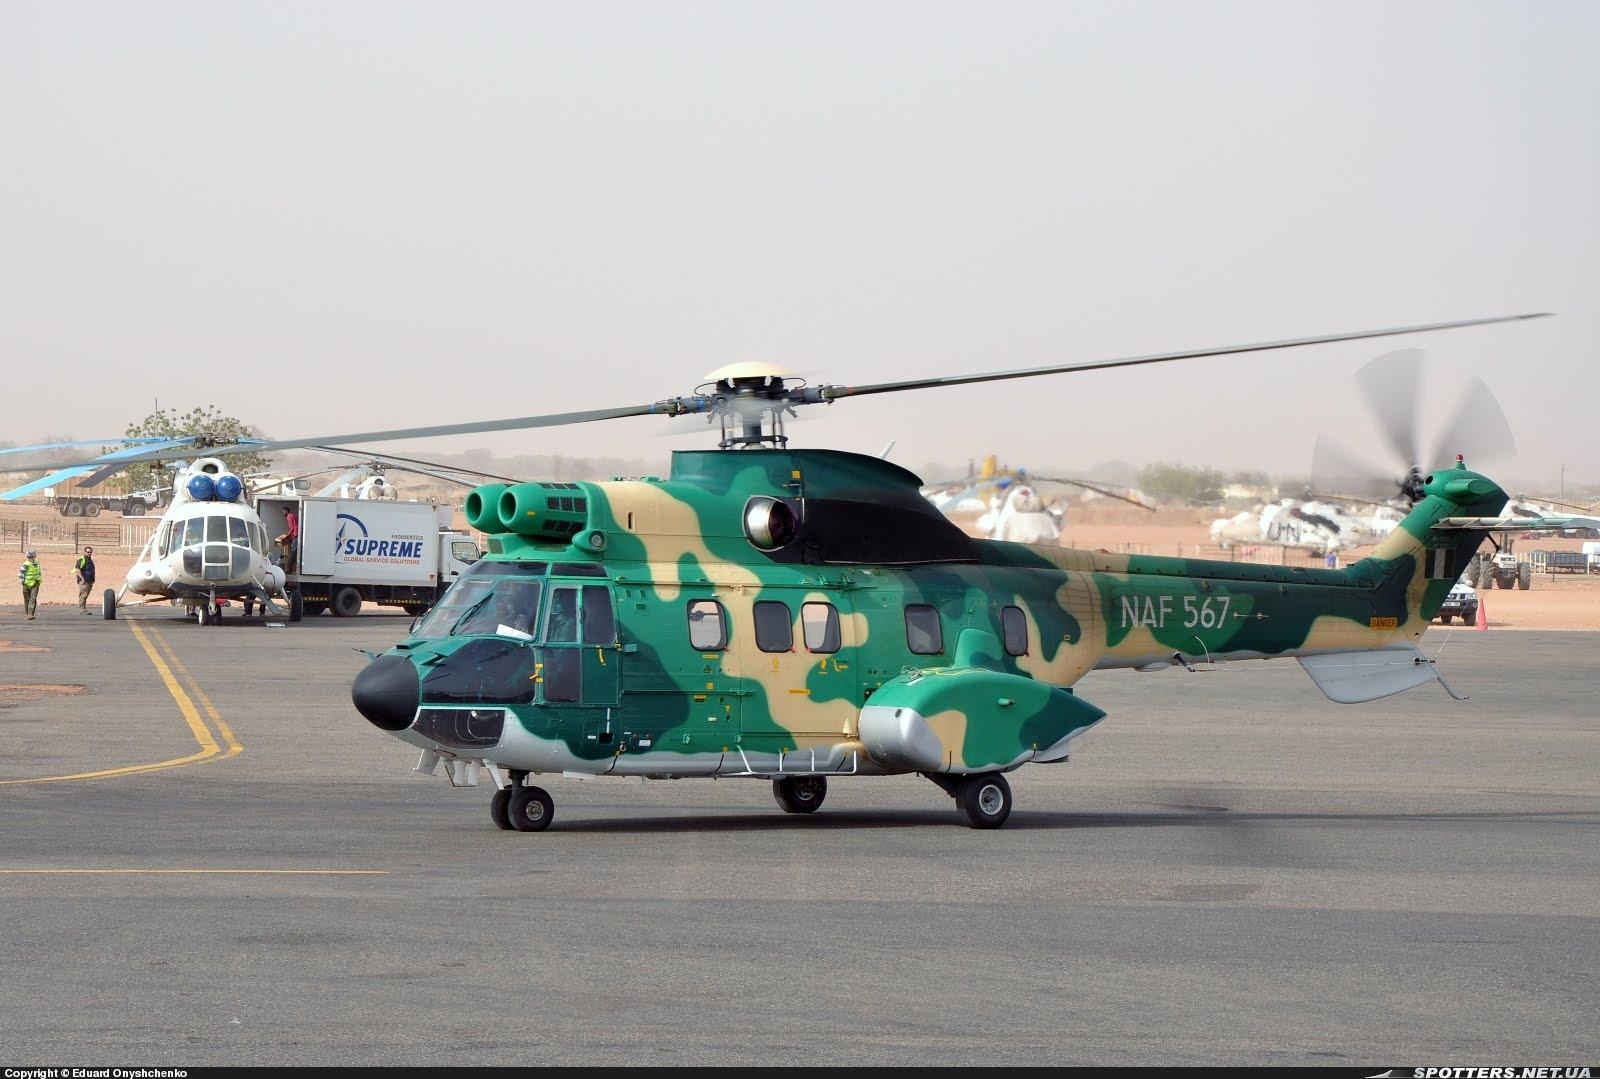 Armée Nigériane / Nigerian Armed Forces - Page 2 SUDAN+NVALA+AEROSPATIALE+AS+332+SUPER+PUMA+NAF+567+NIGERIANO+14-03-2012